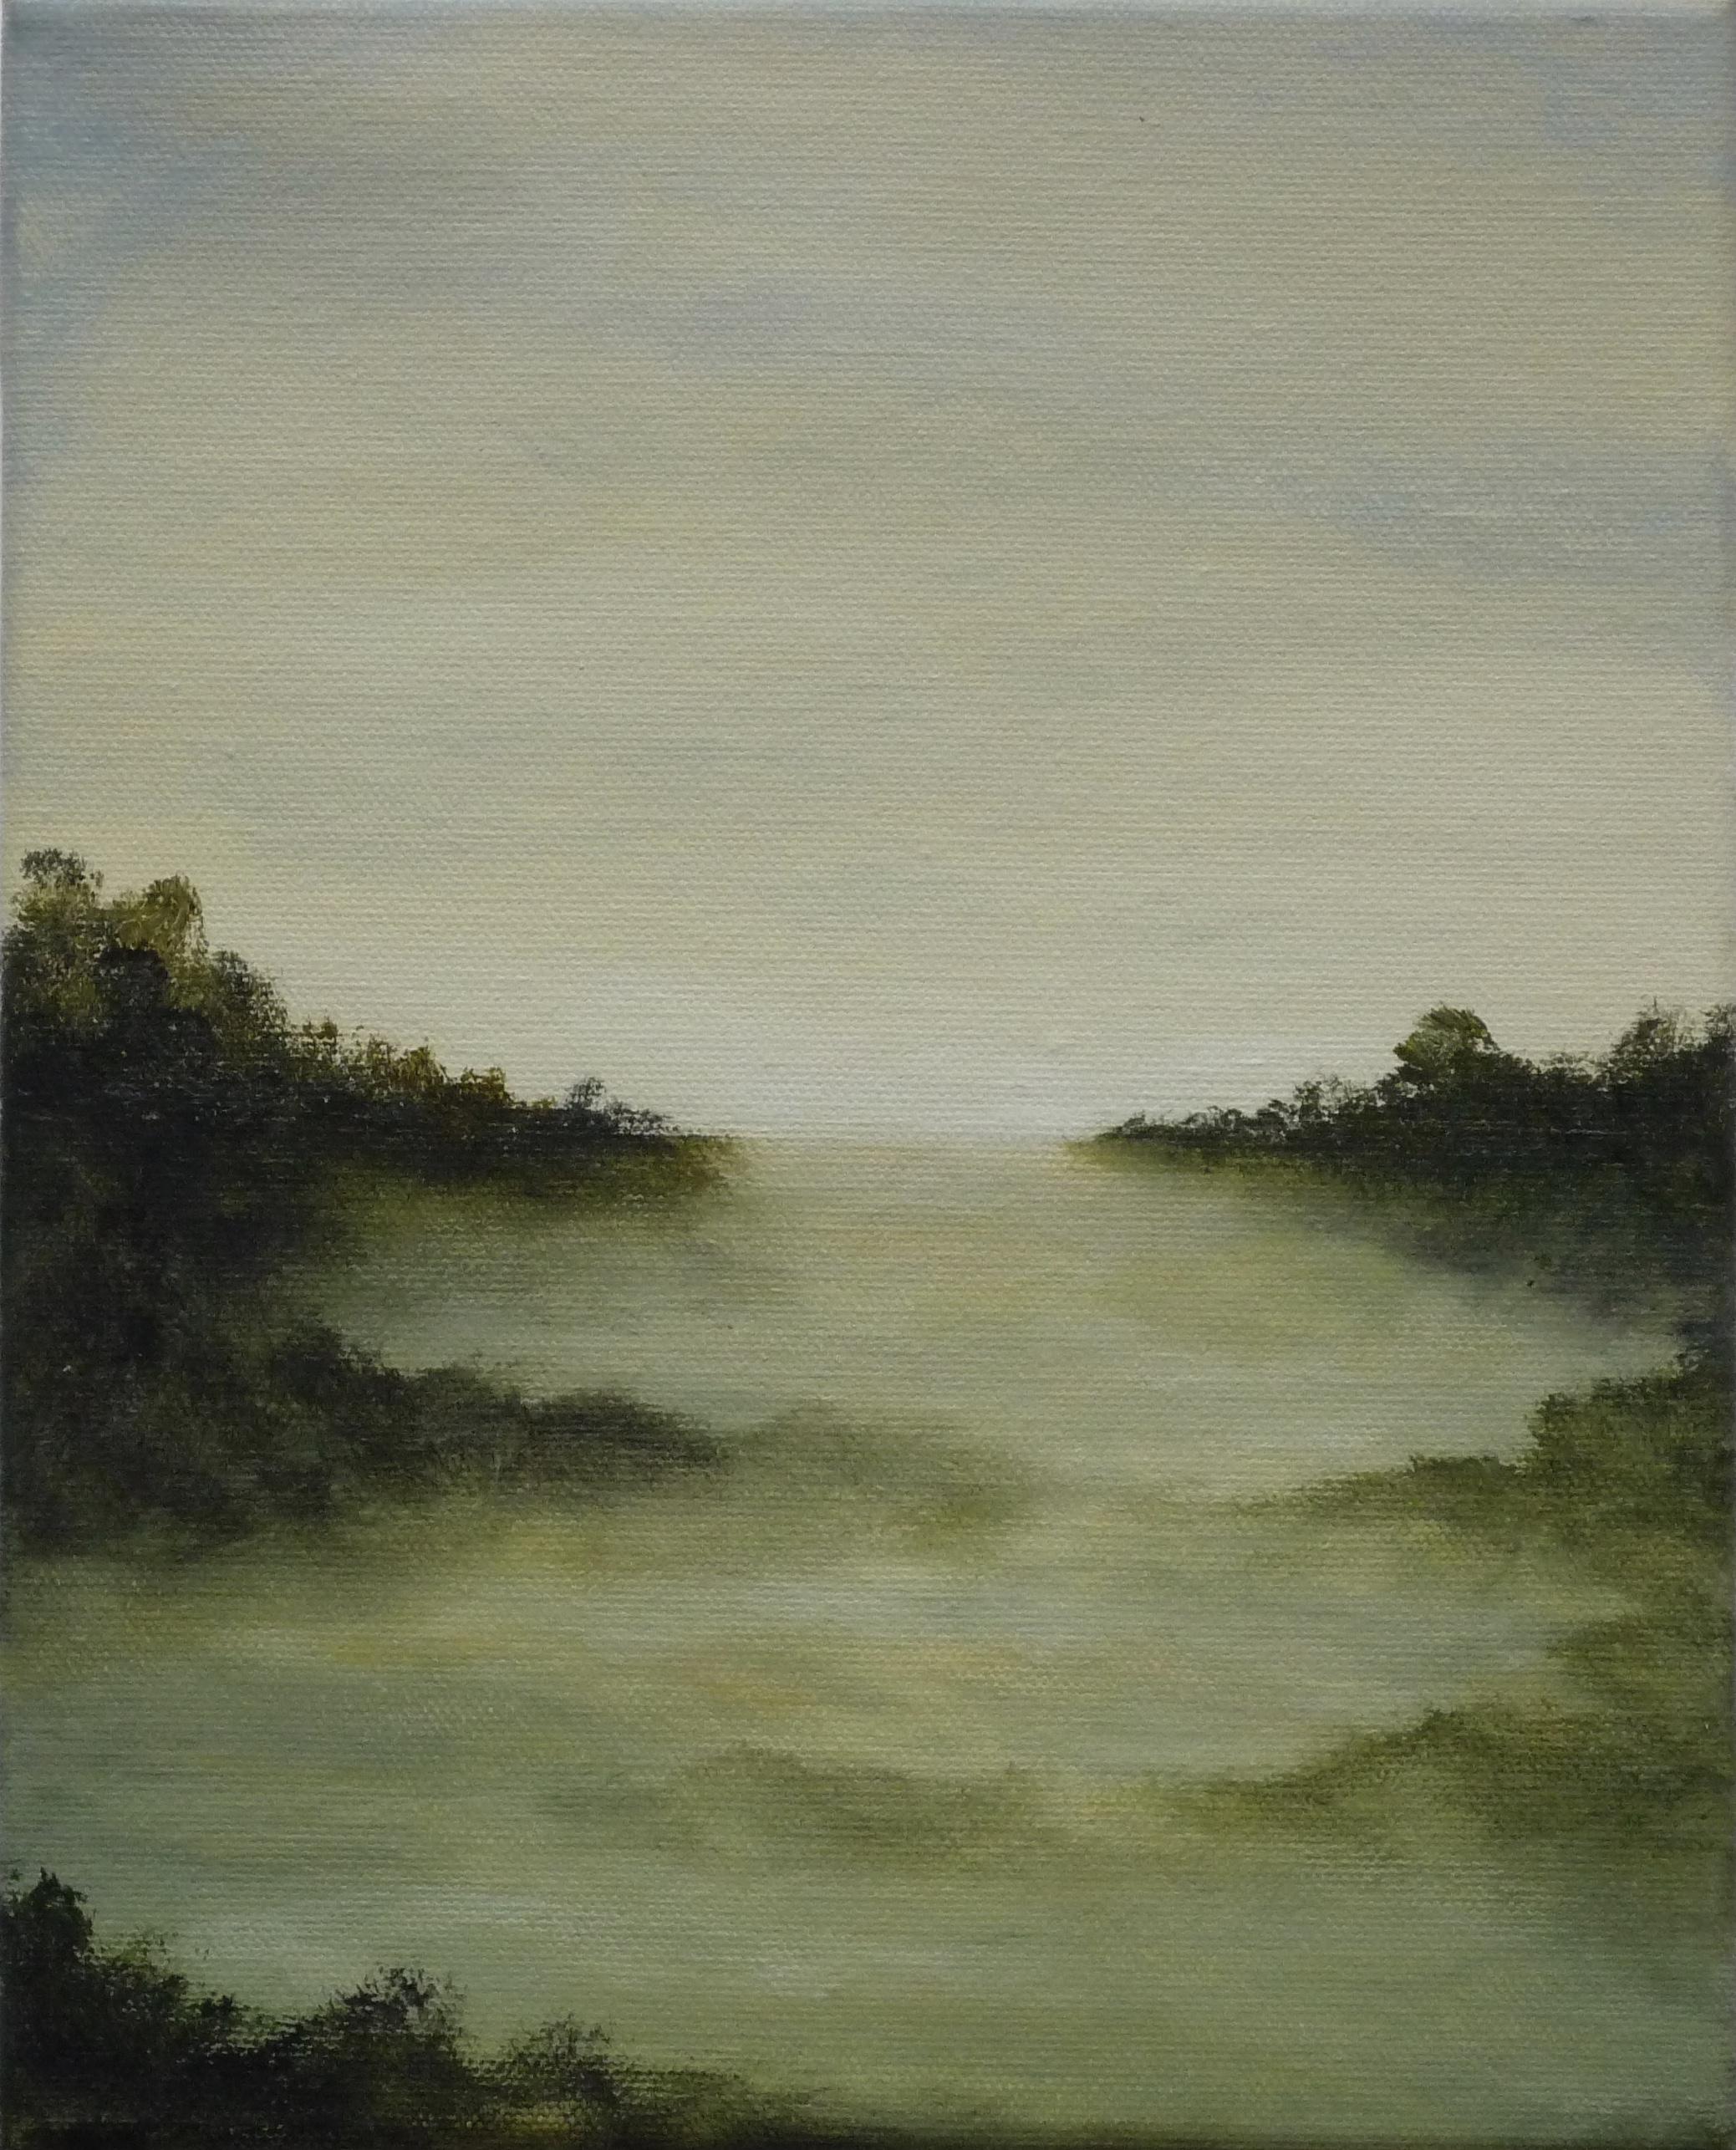 Untitled_Landscape IV